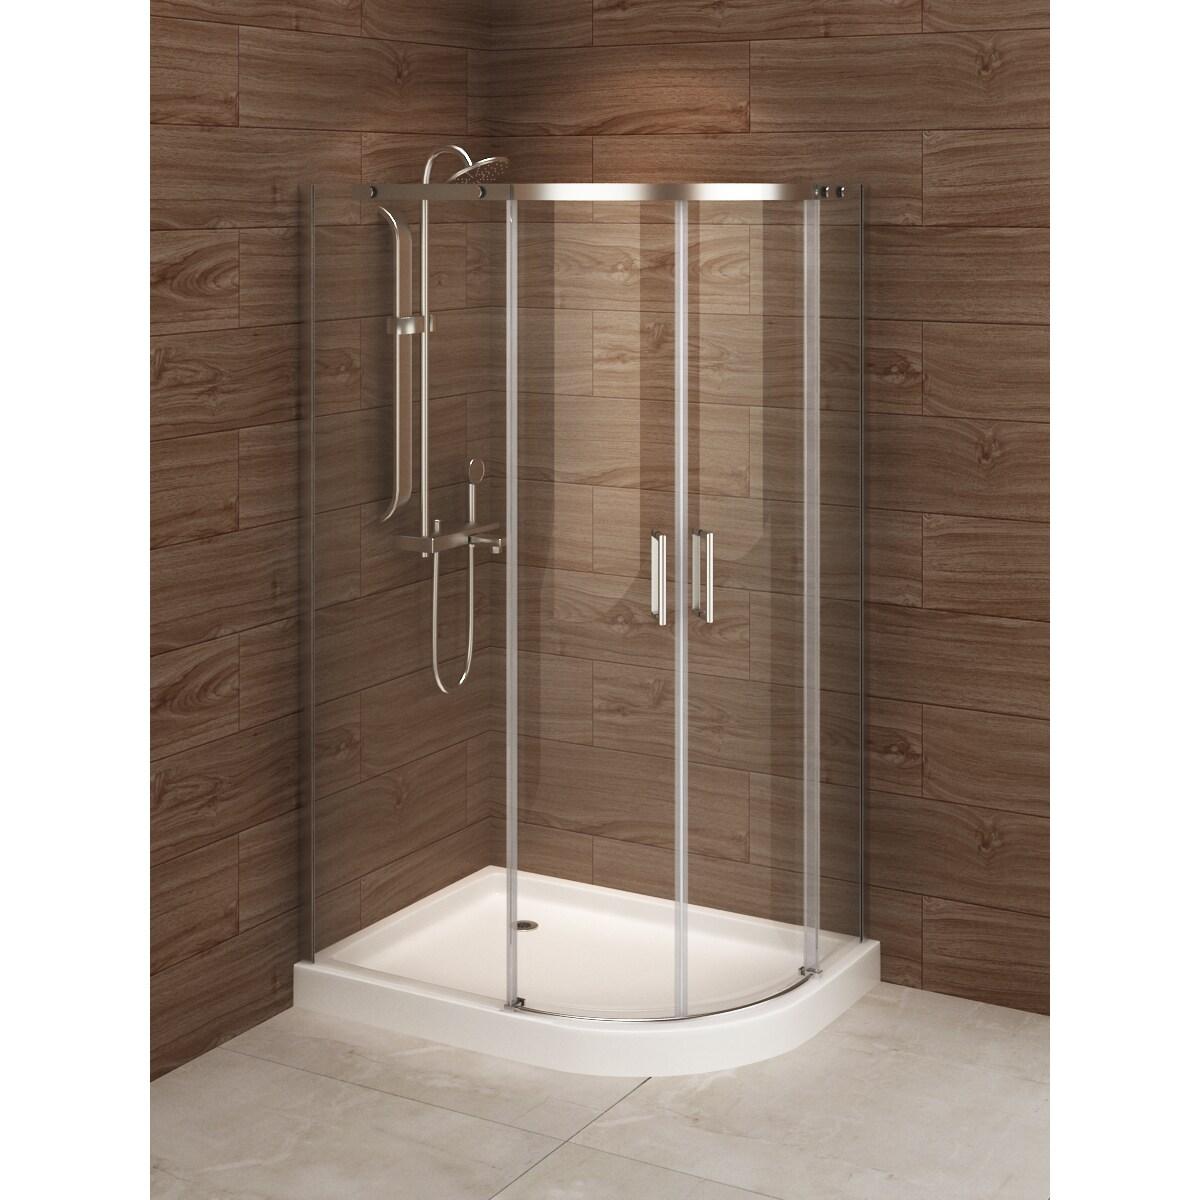 Shop Madrid 48-inch x 36-inch Asymmetric Right-opening Corner Shower ...